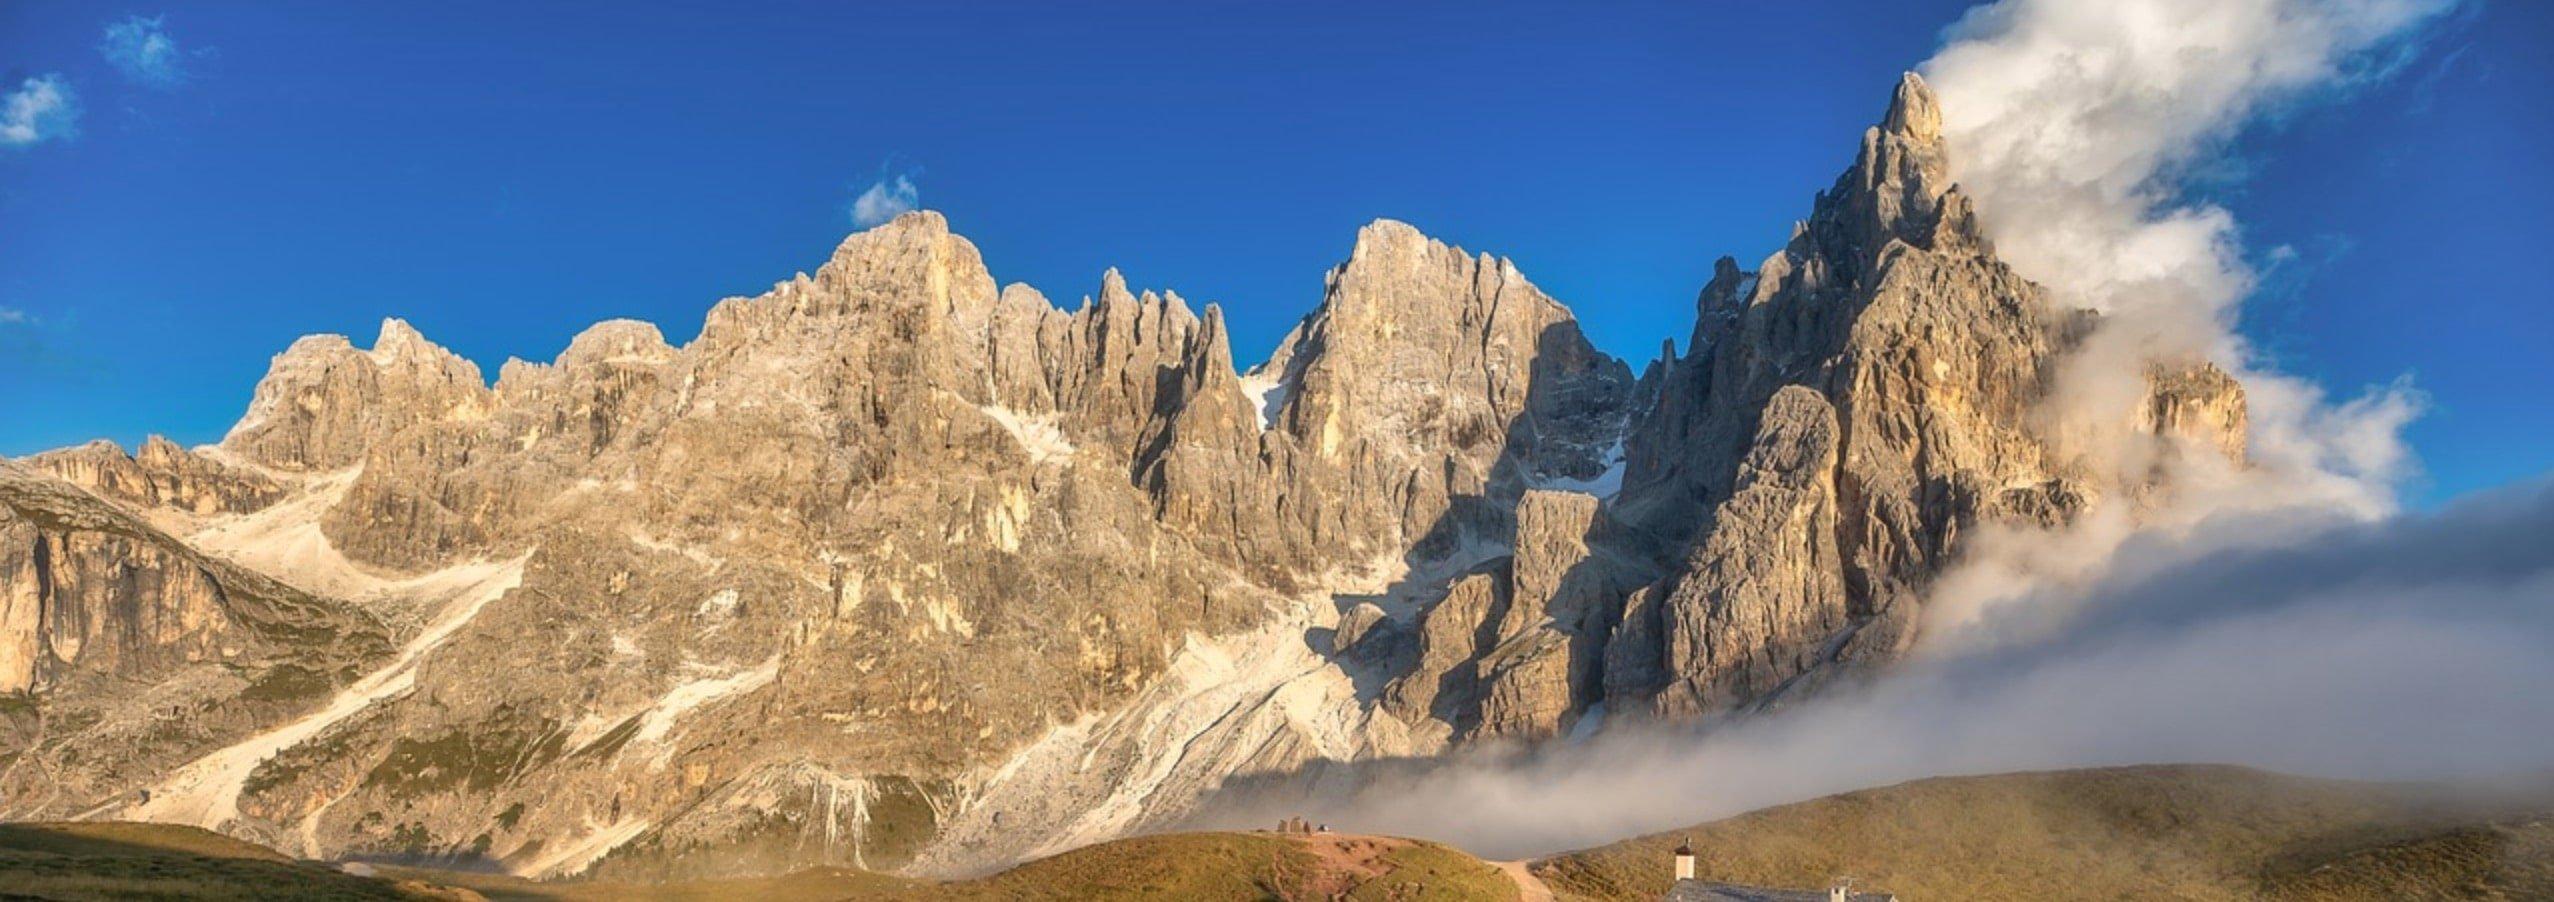 montagne en europe